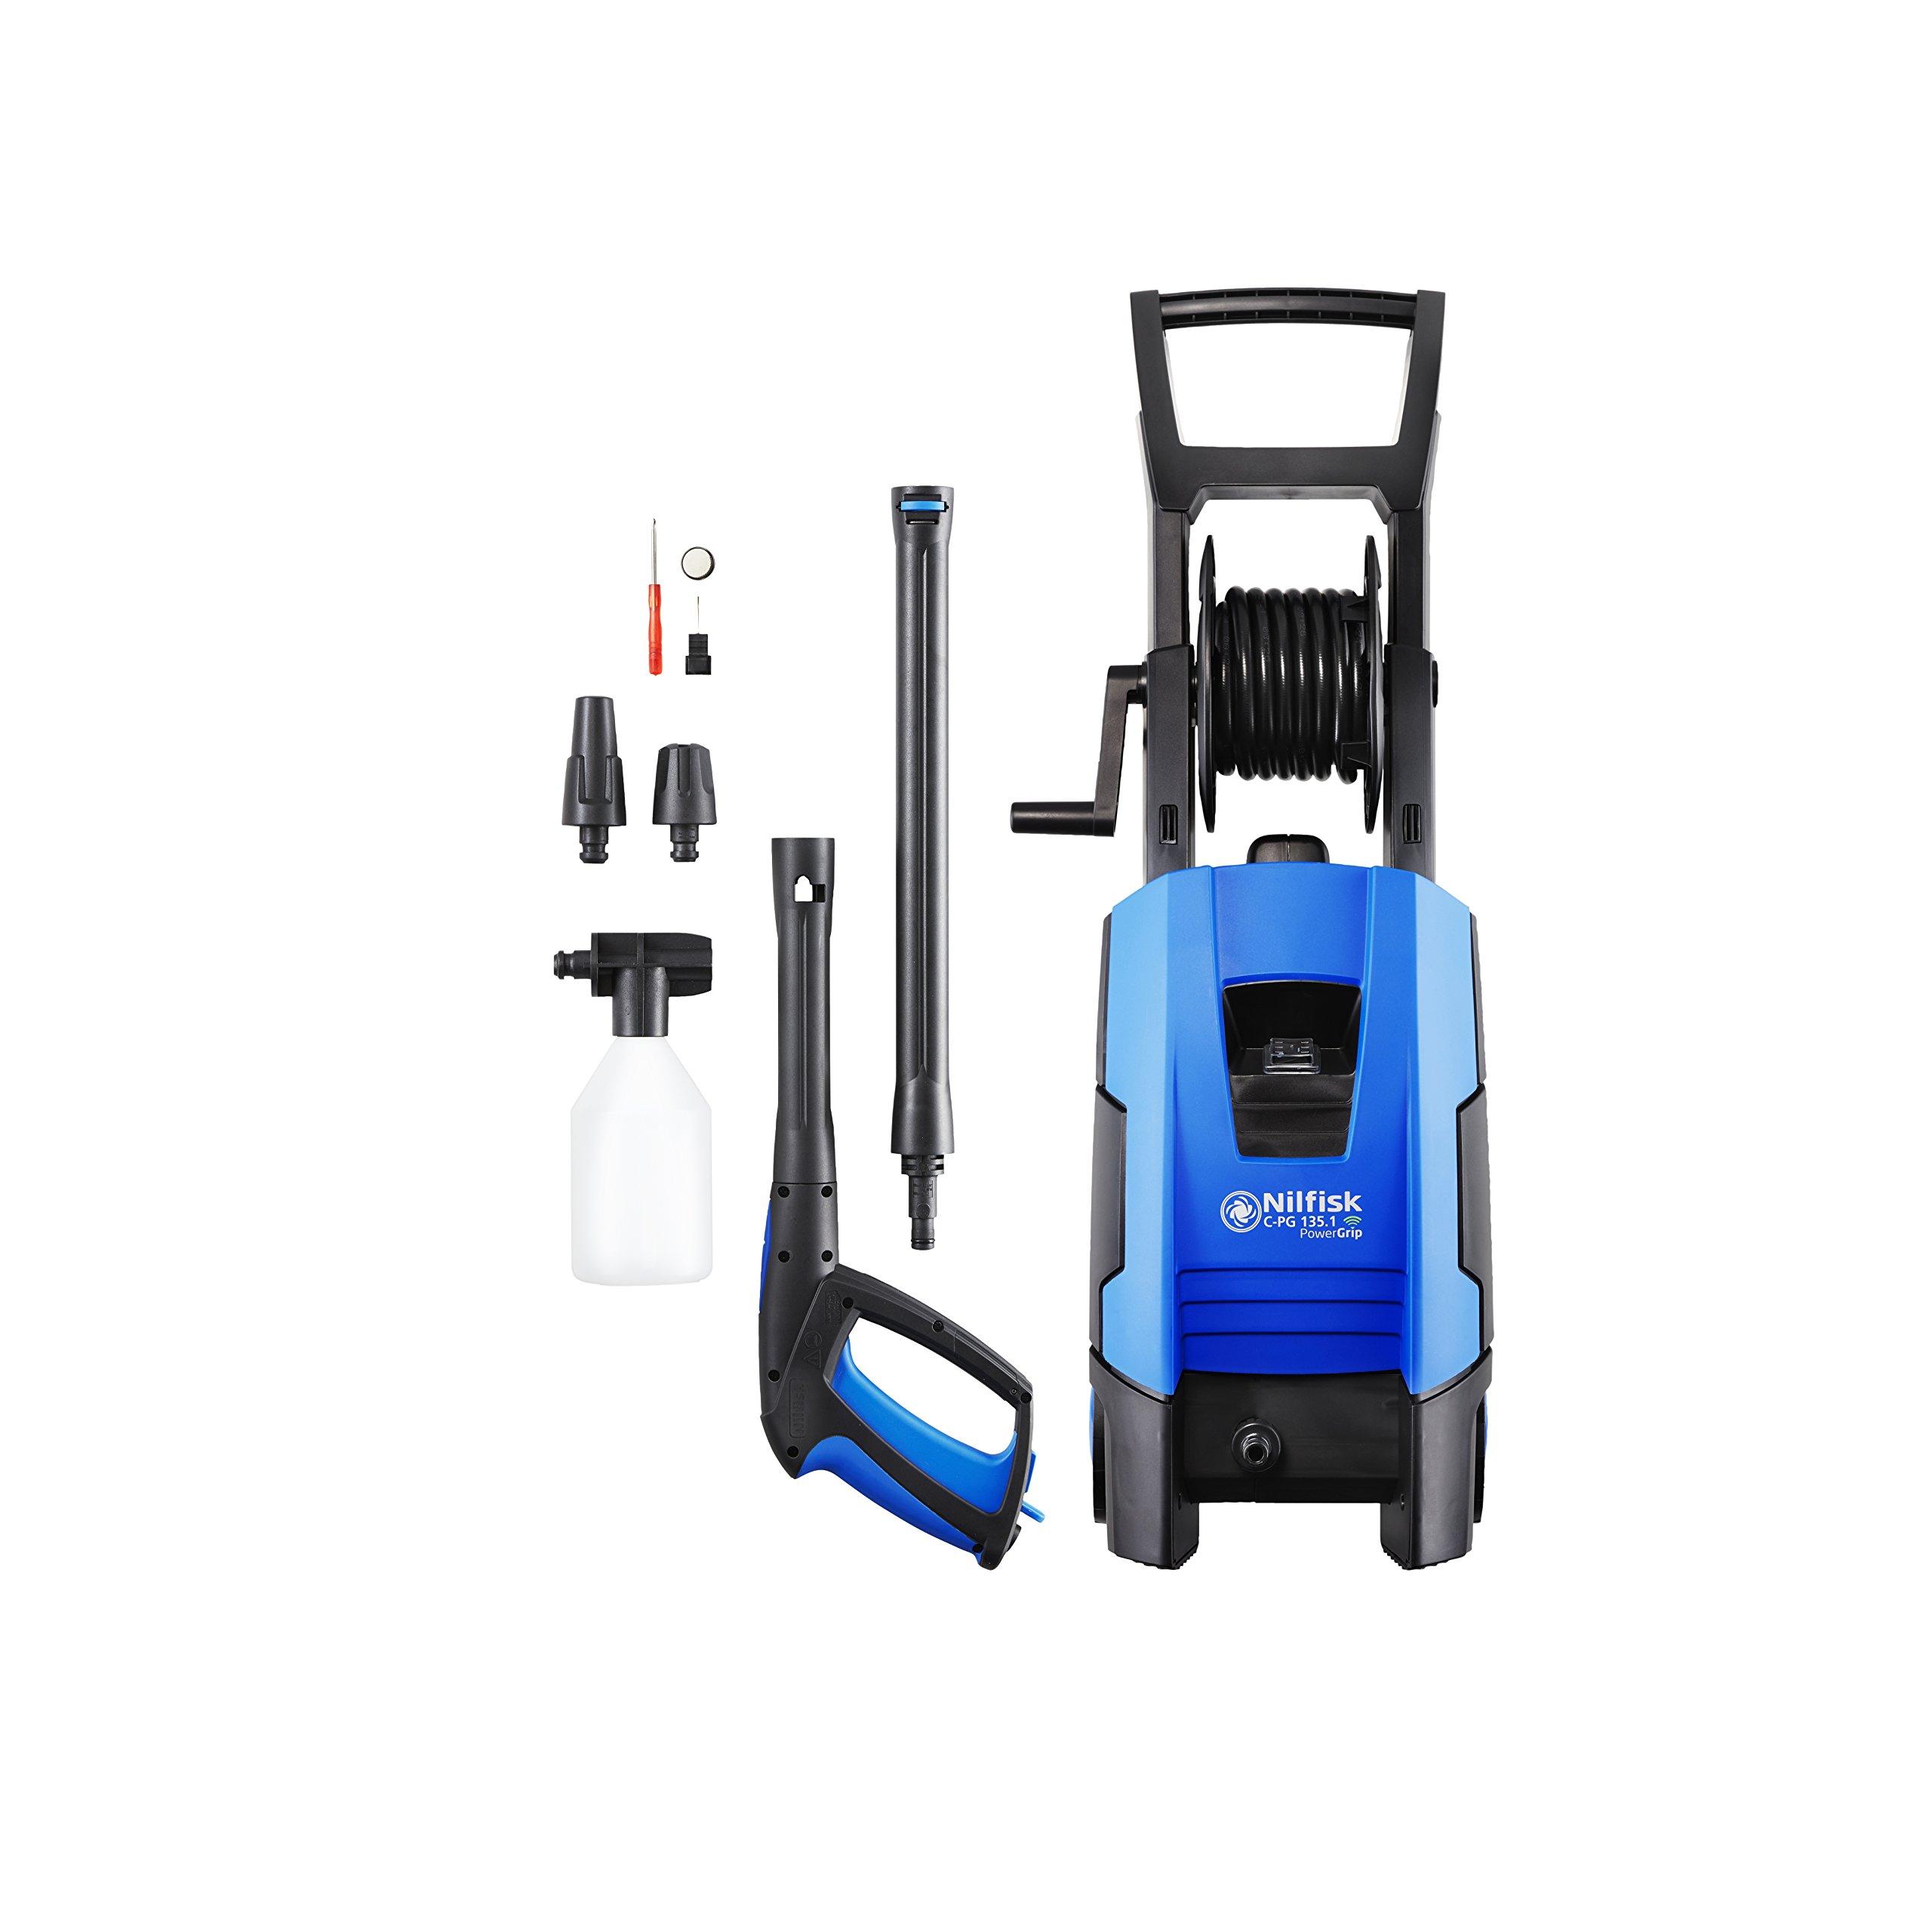 Nilfisk-128471165-C-PG-1351-8-X-tra-Hochdruckreiniger-1800-W-230-V-Blau